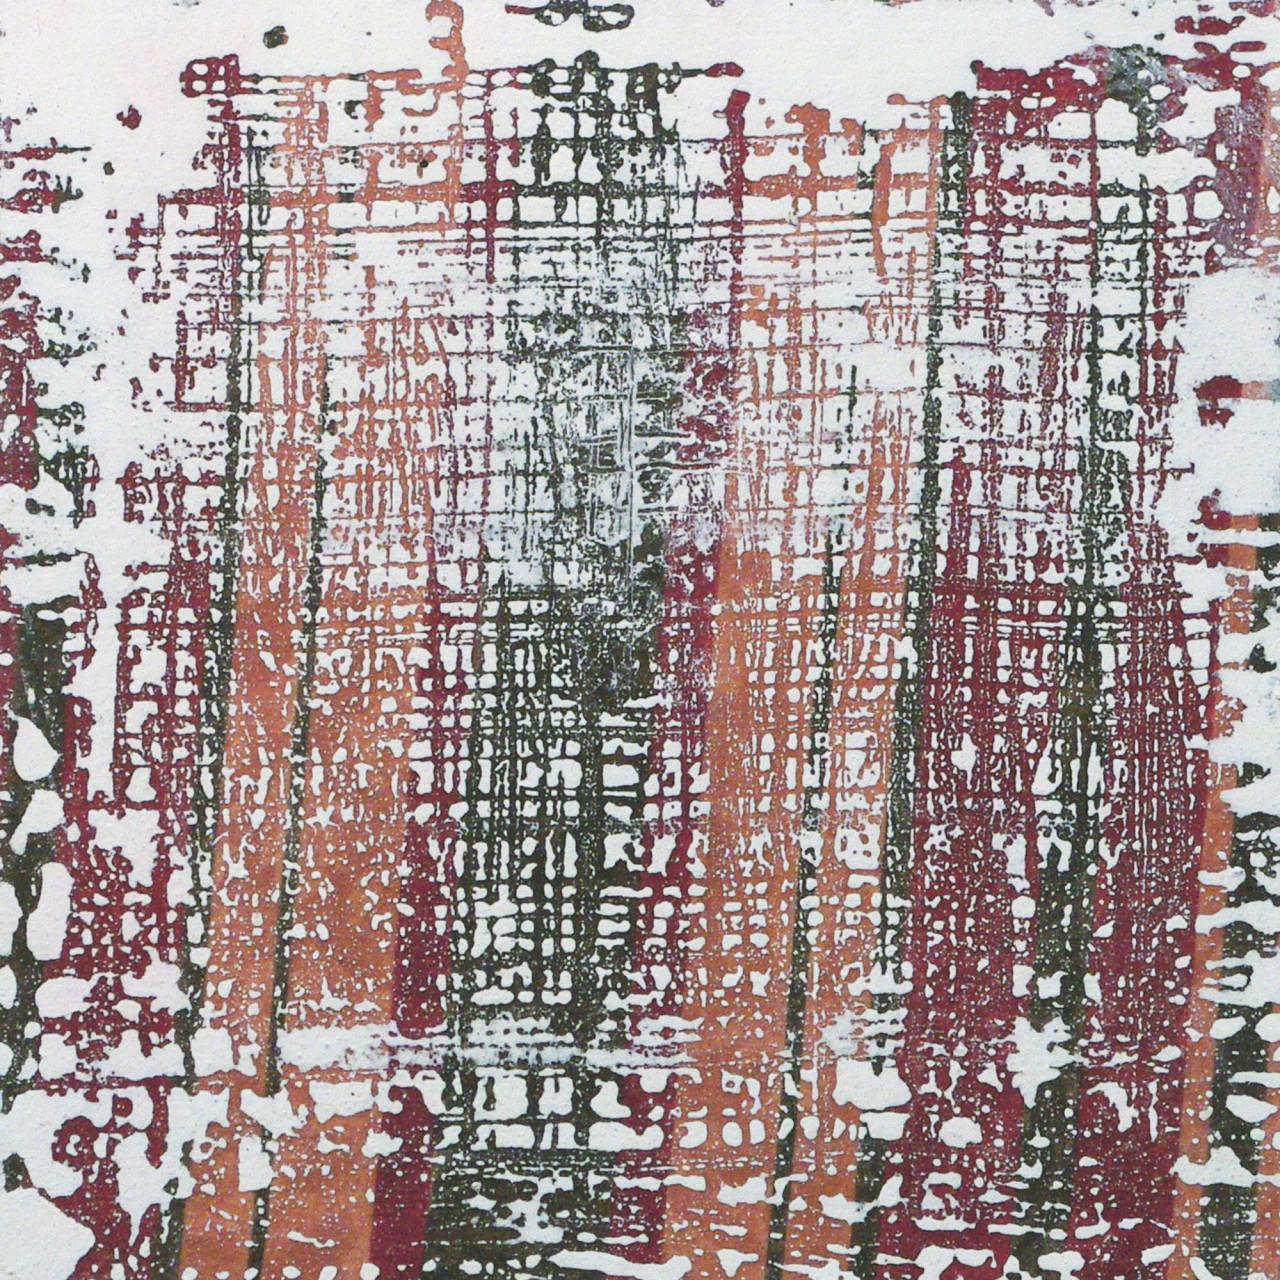 623.1, 2015 tecnica mista su tavola 23x23 cm